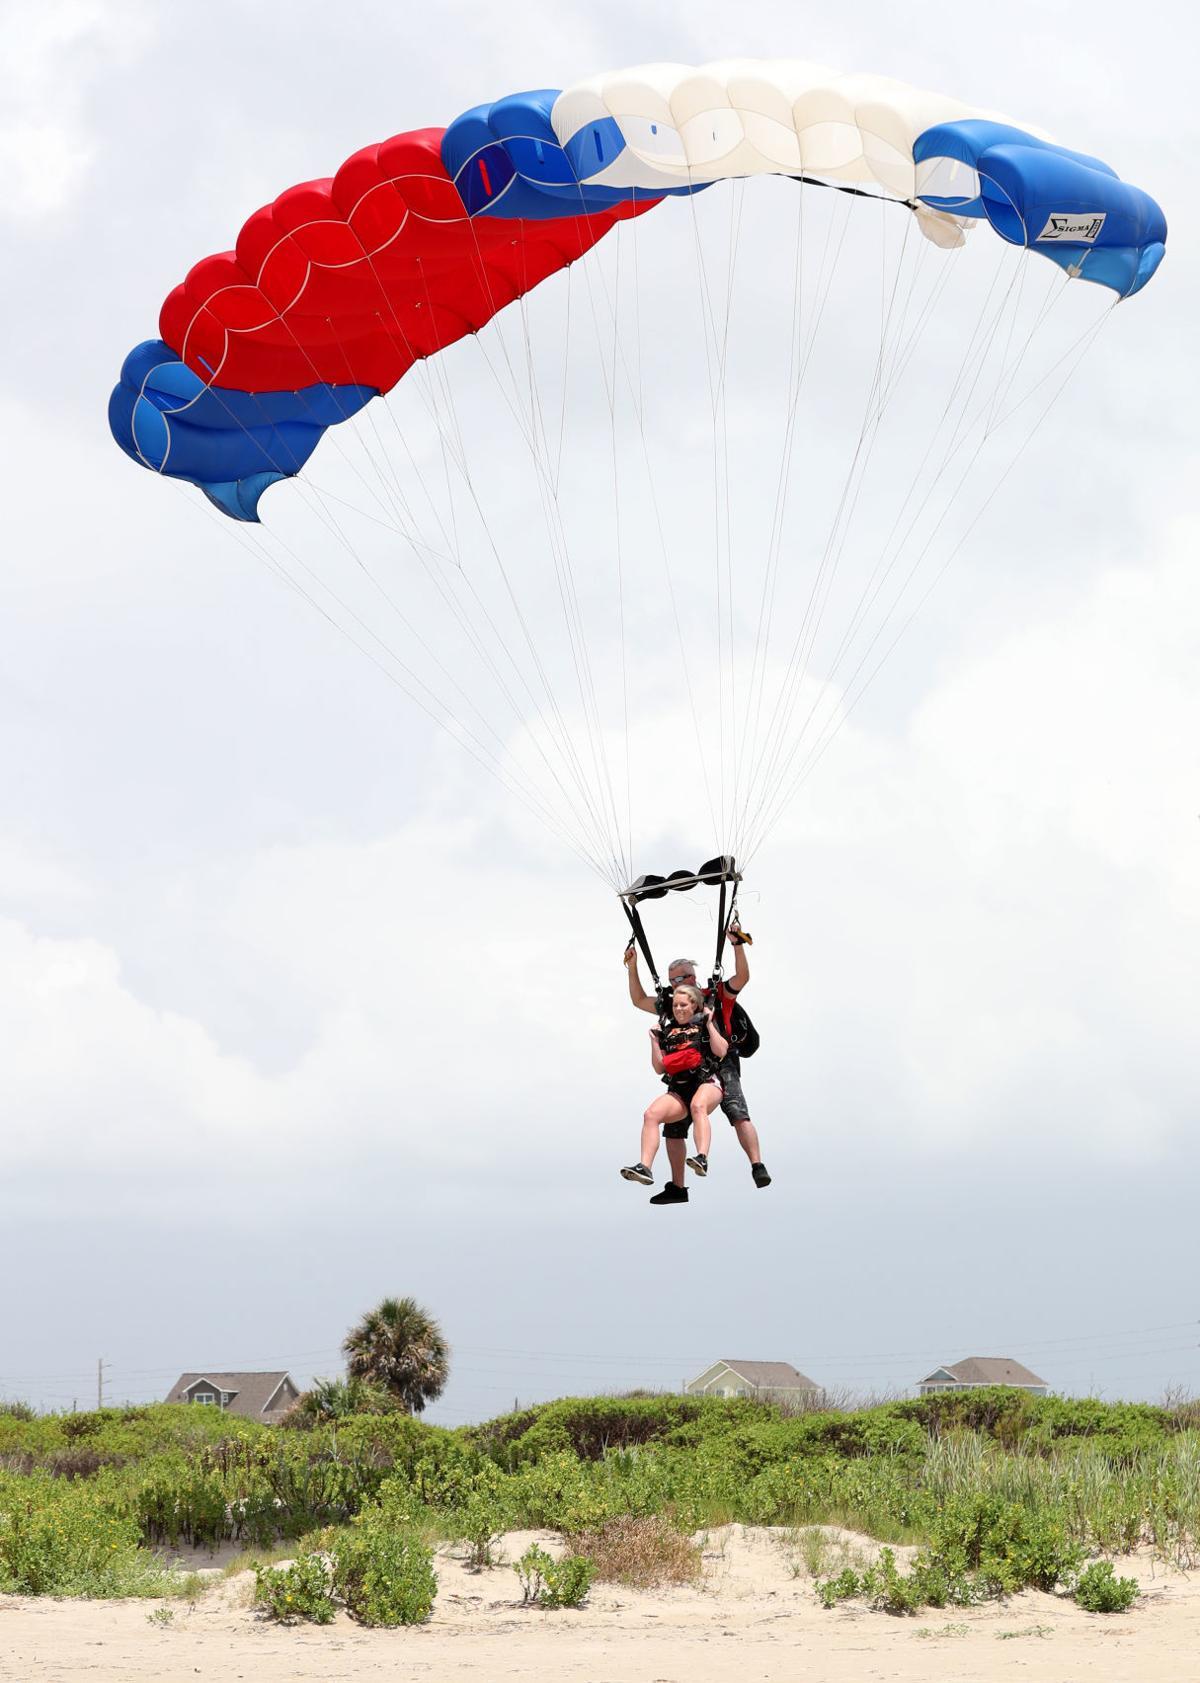 Skydiving in Galveston